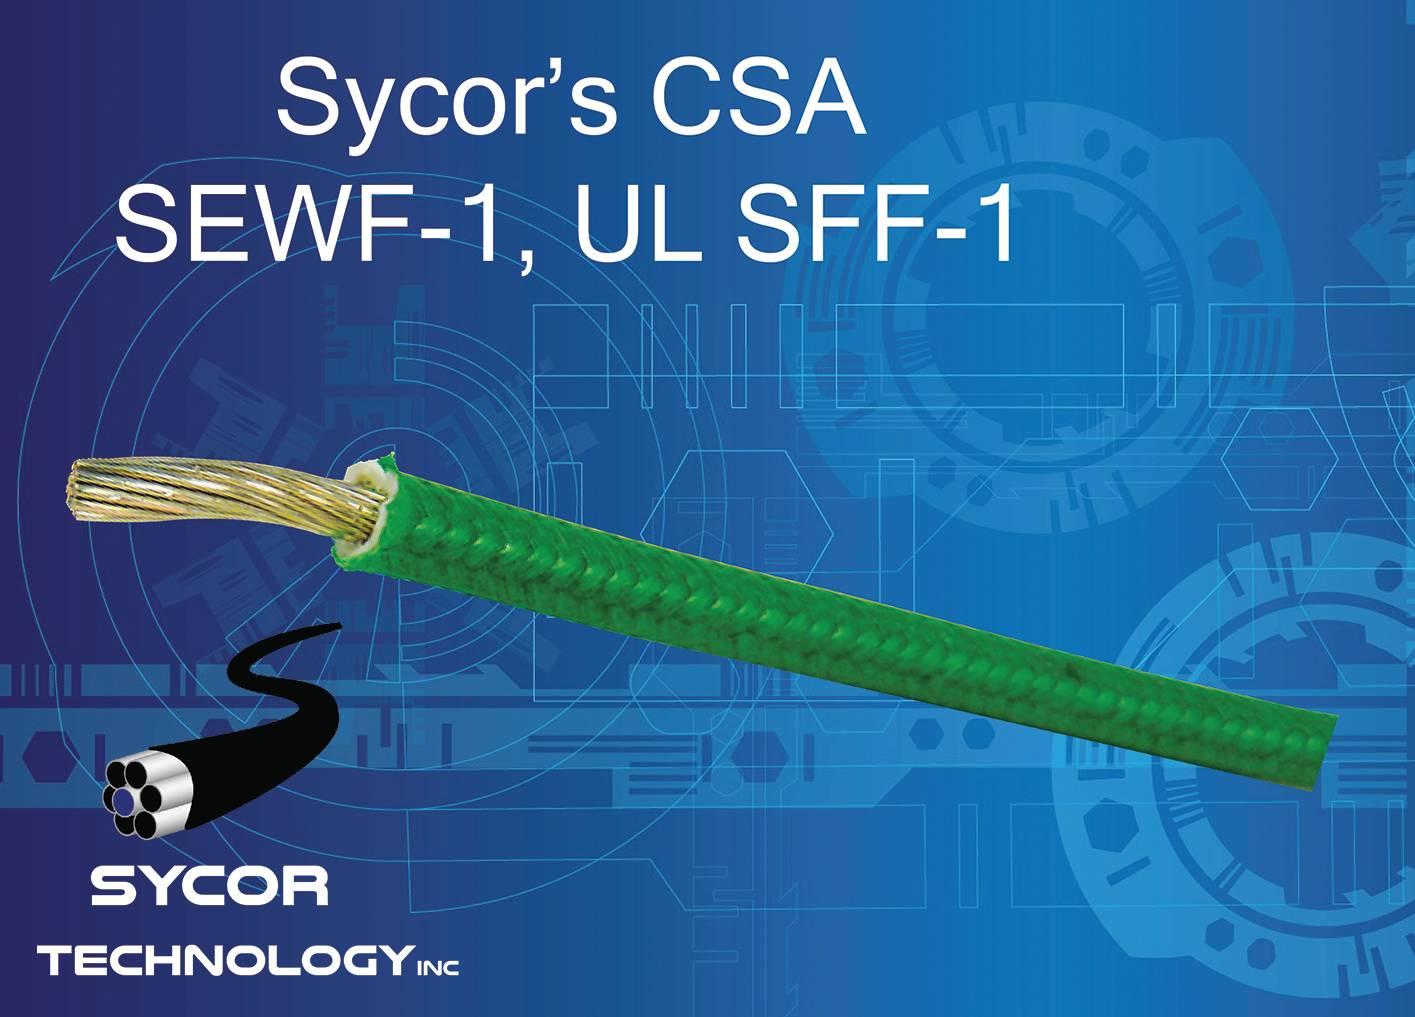 CSA SEWF-1, UL SFF-1